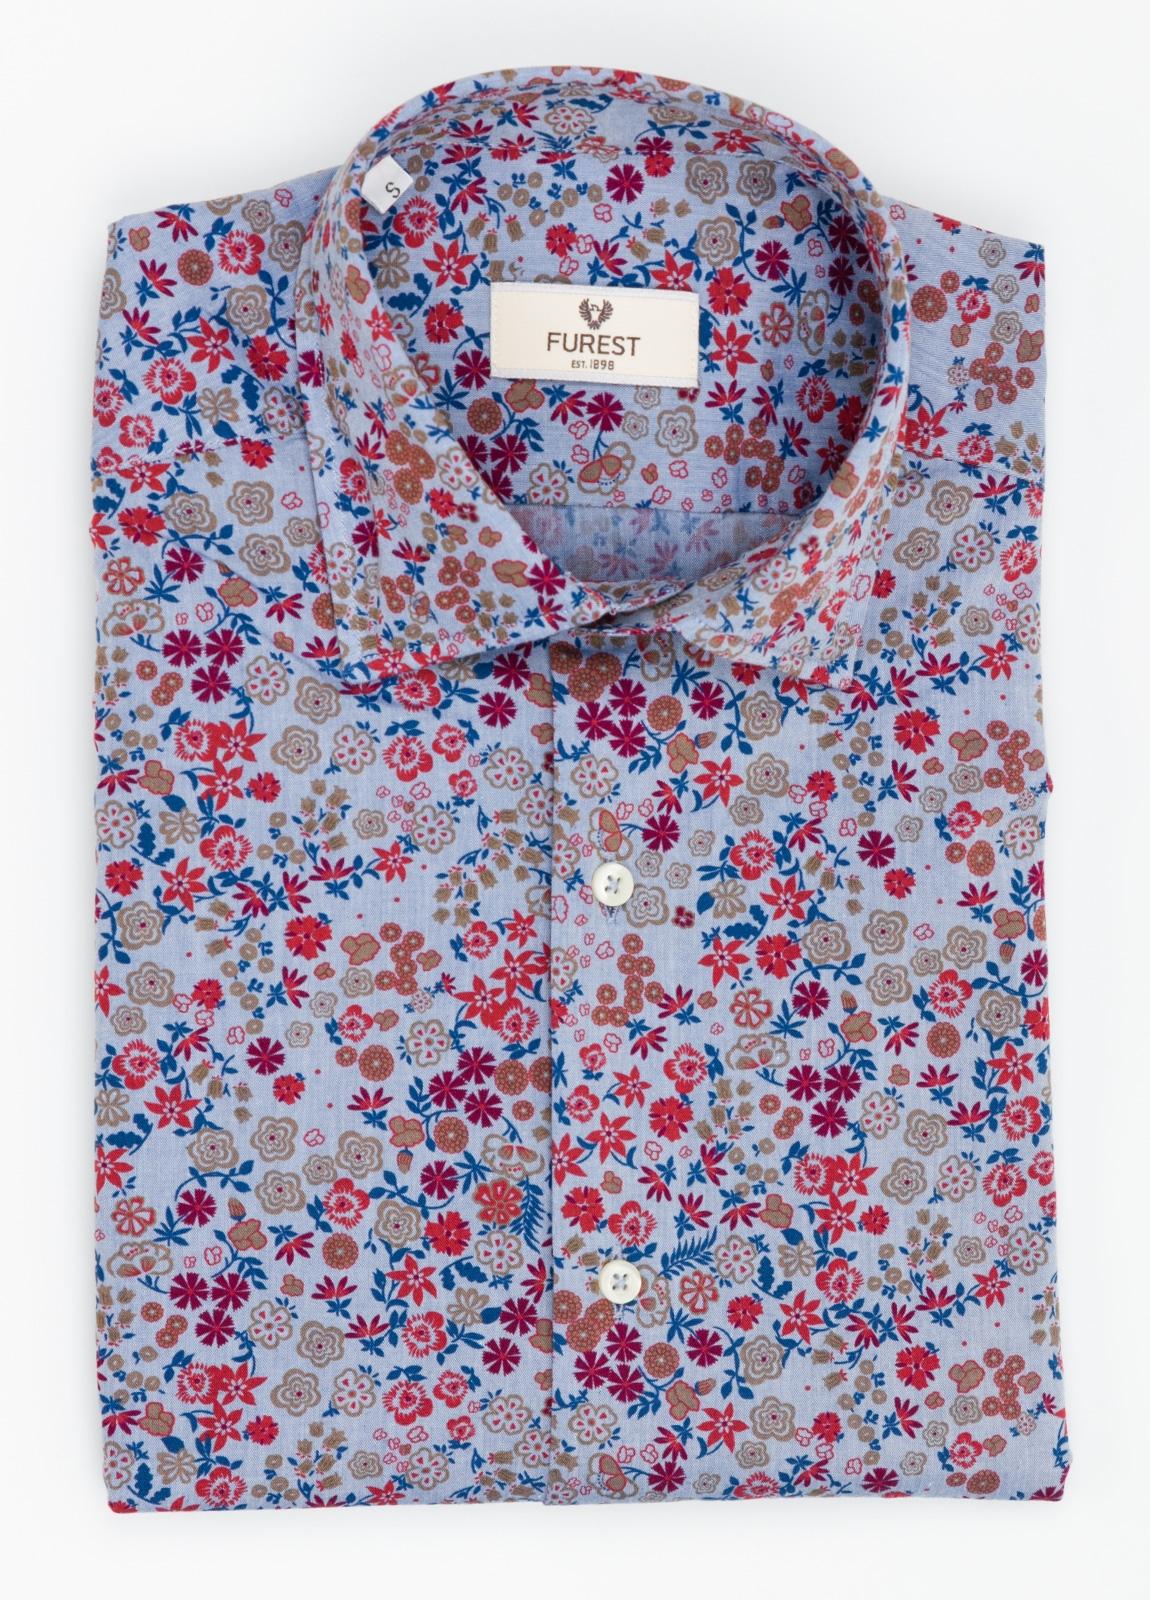 Camisa Leisure Wear SLIM FIT modelo PORTO dibujo floral fondo blanco. 100% Algodón. - Ítem2